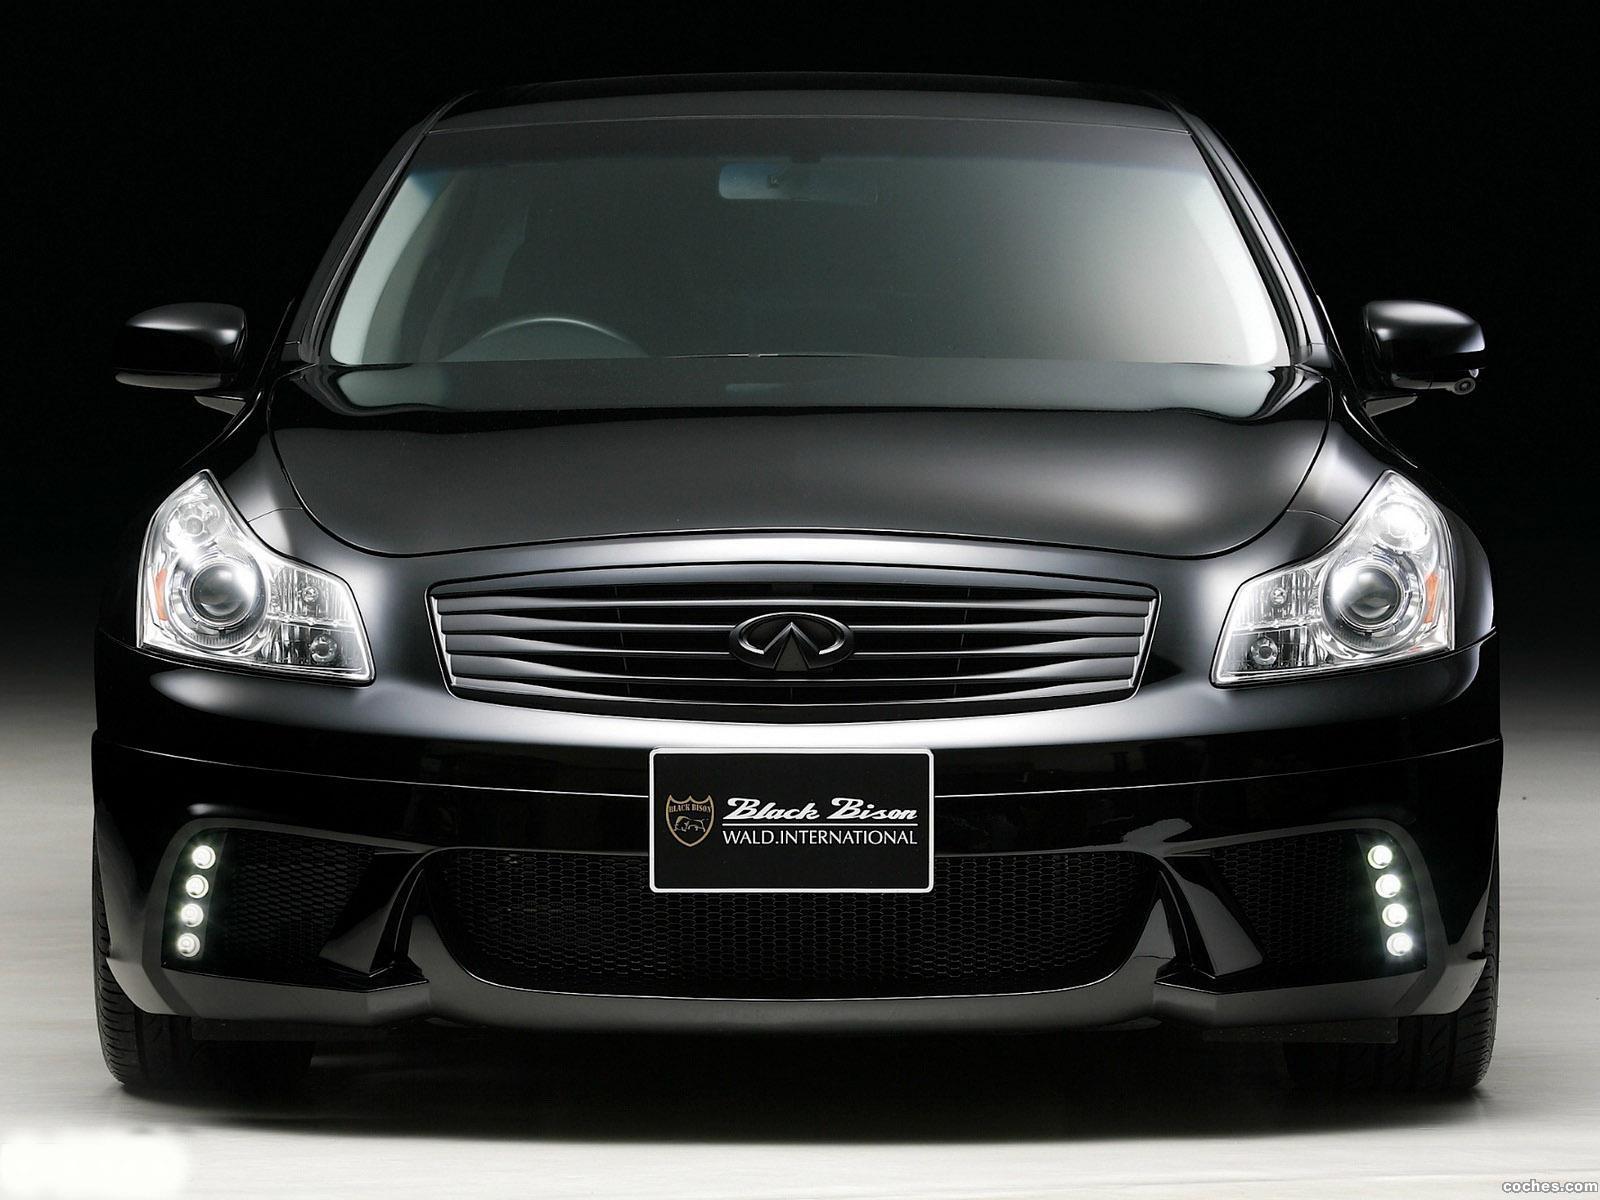 Foto 0 de WALD Infiniti G37 Black Bison Edition 2011